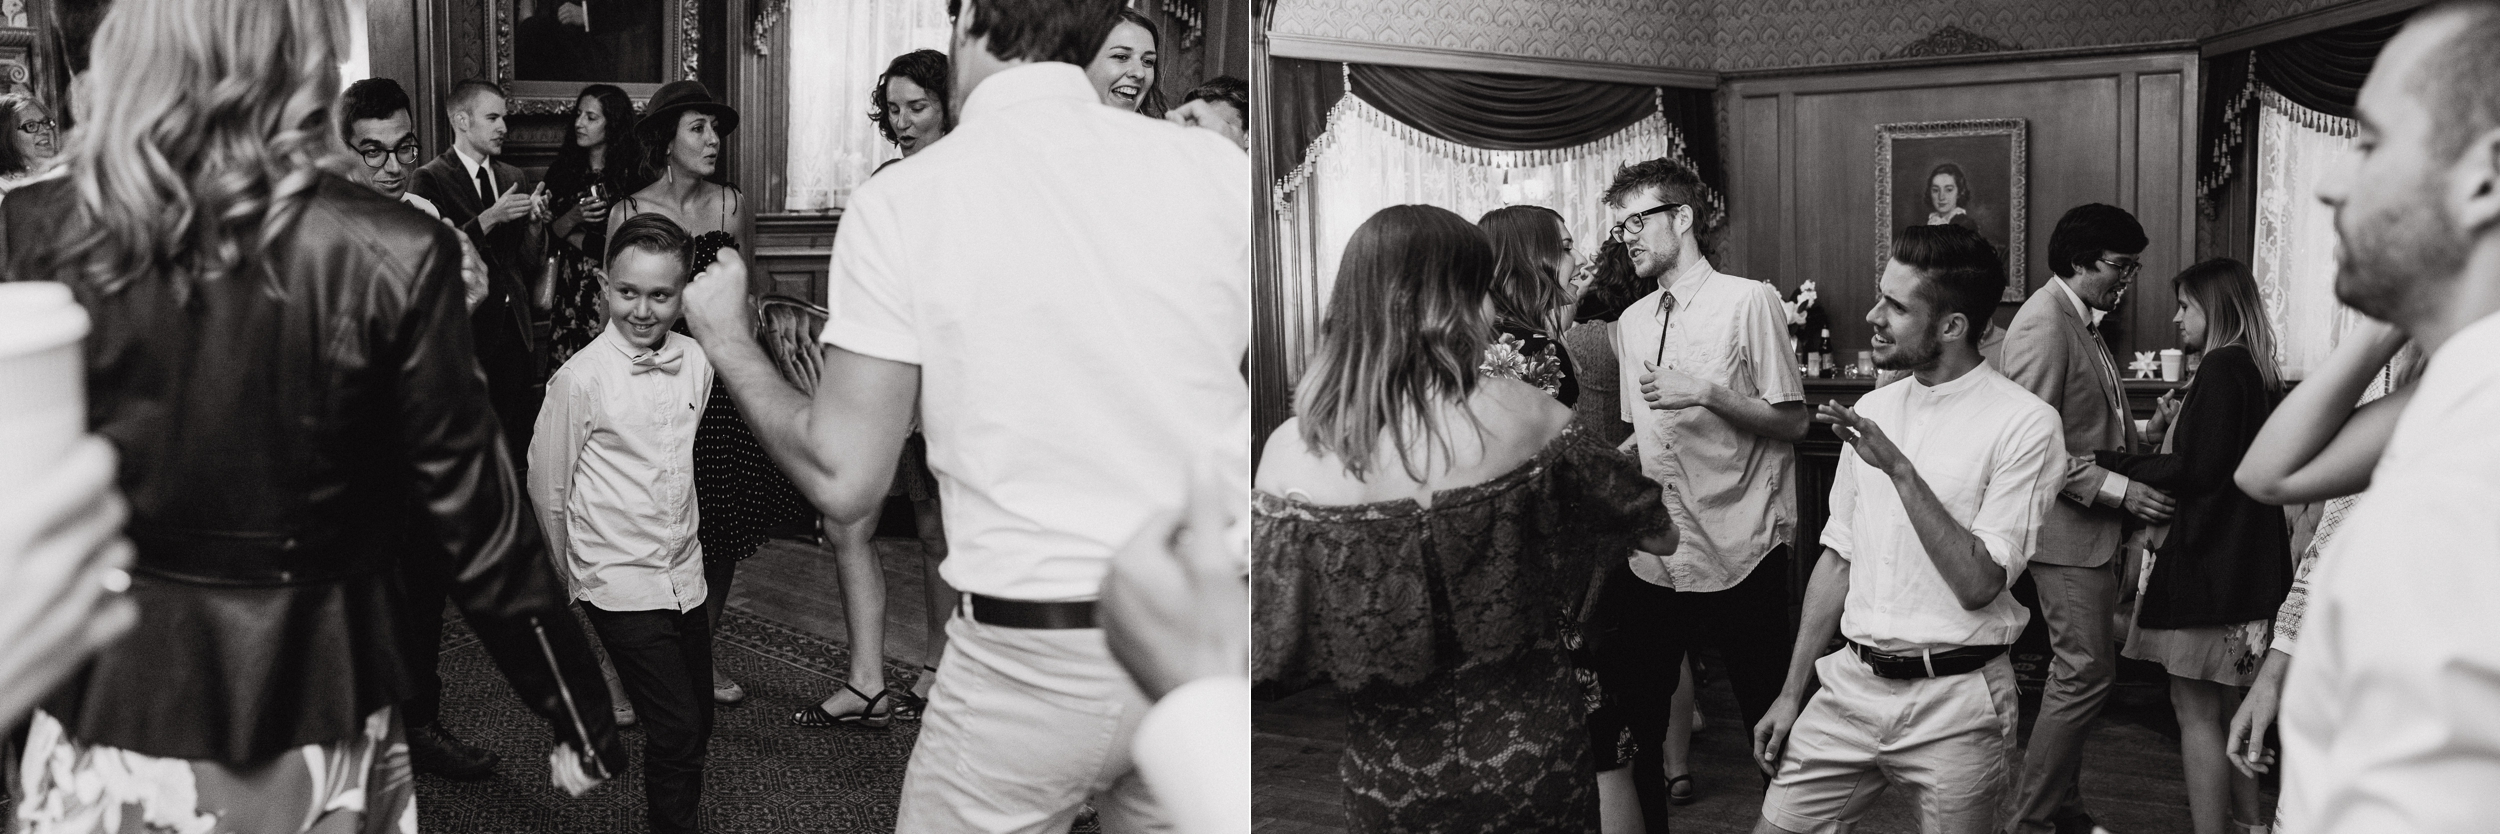 095-lgbtq-falkirk-cultural-center-wedding-photographer-vivianchen-843_WEB.jpg